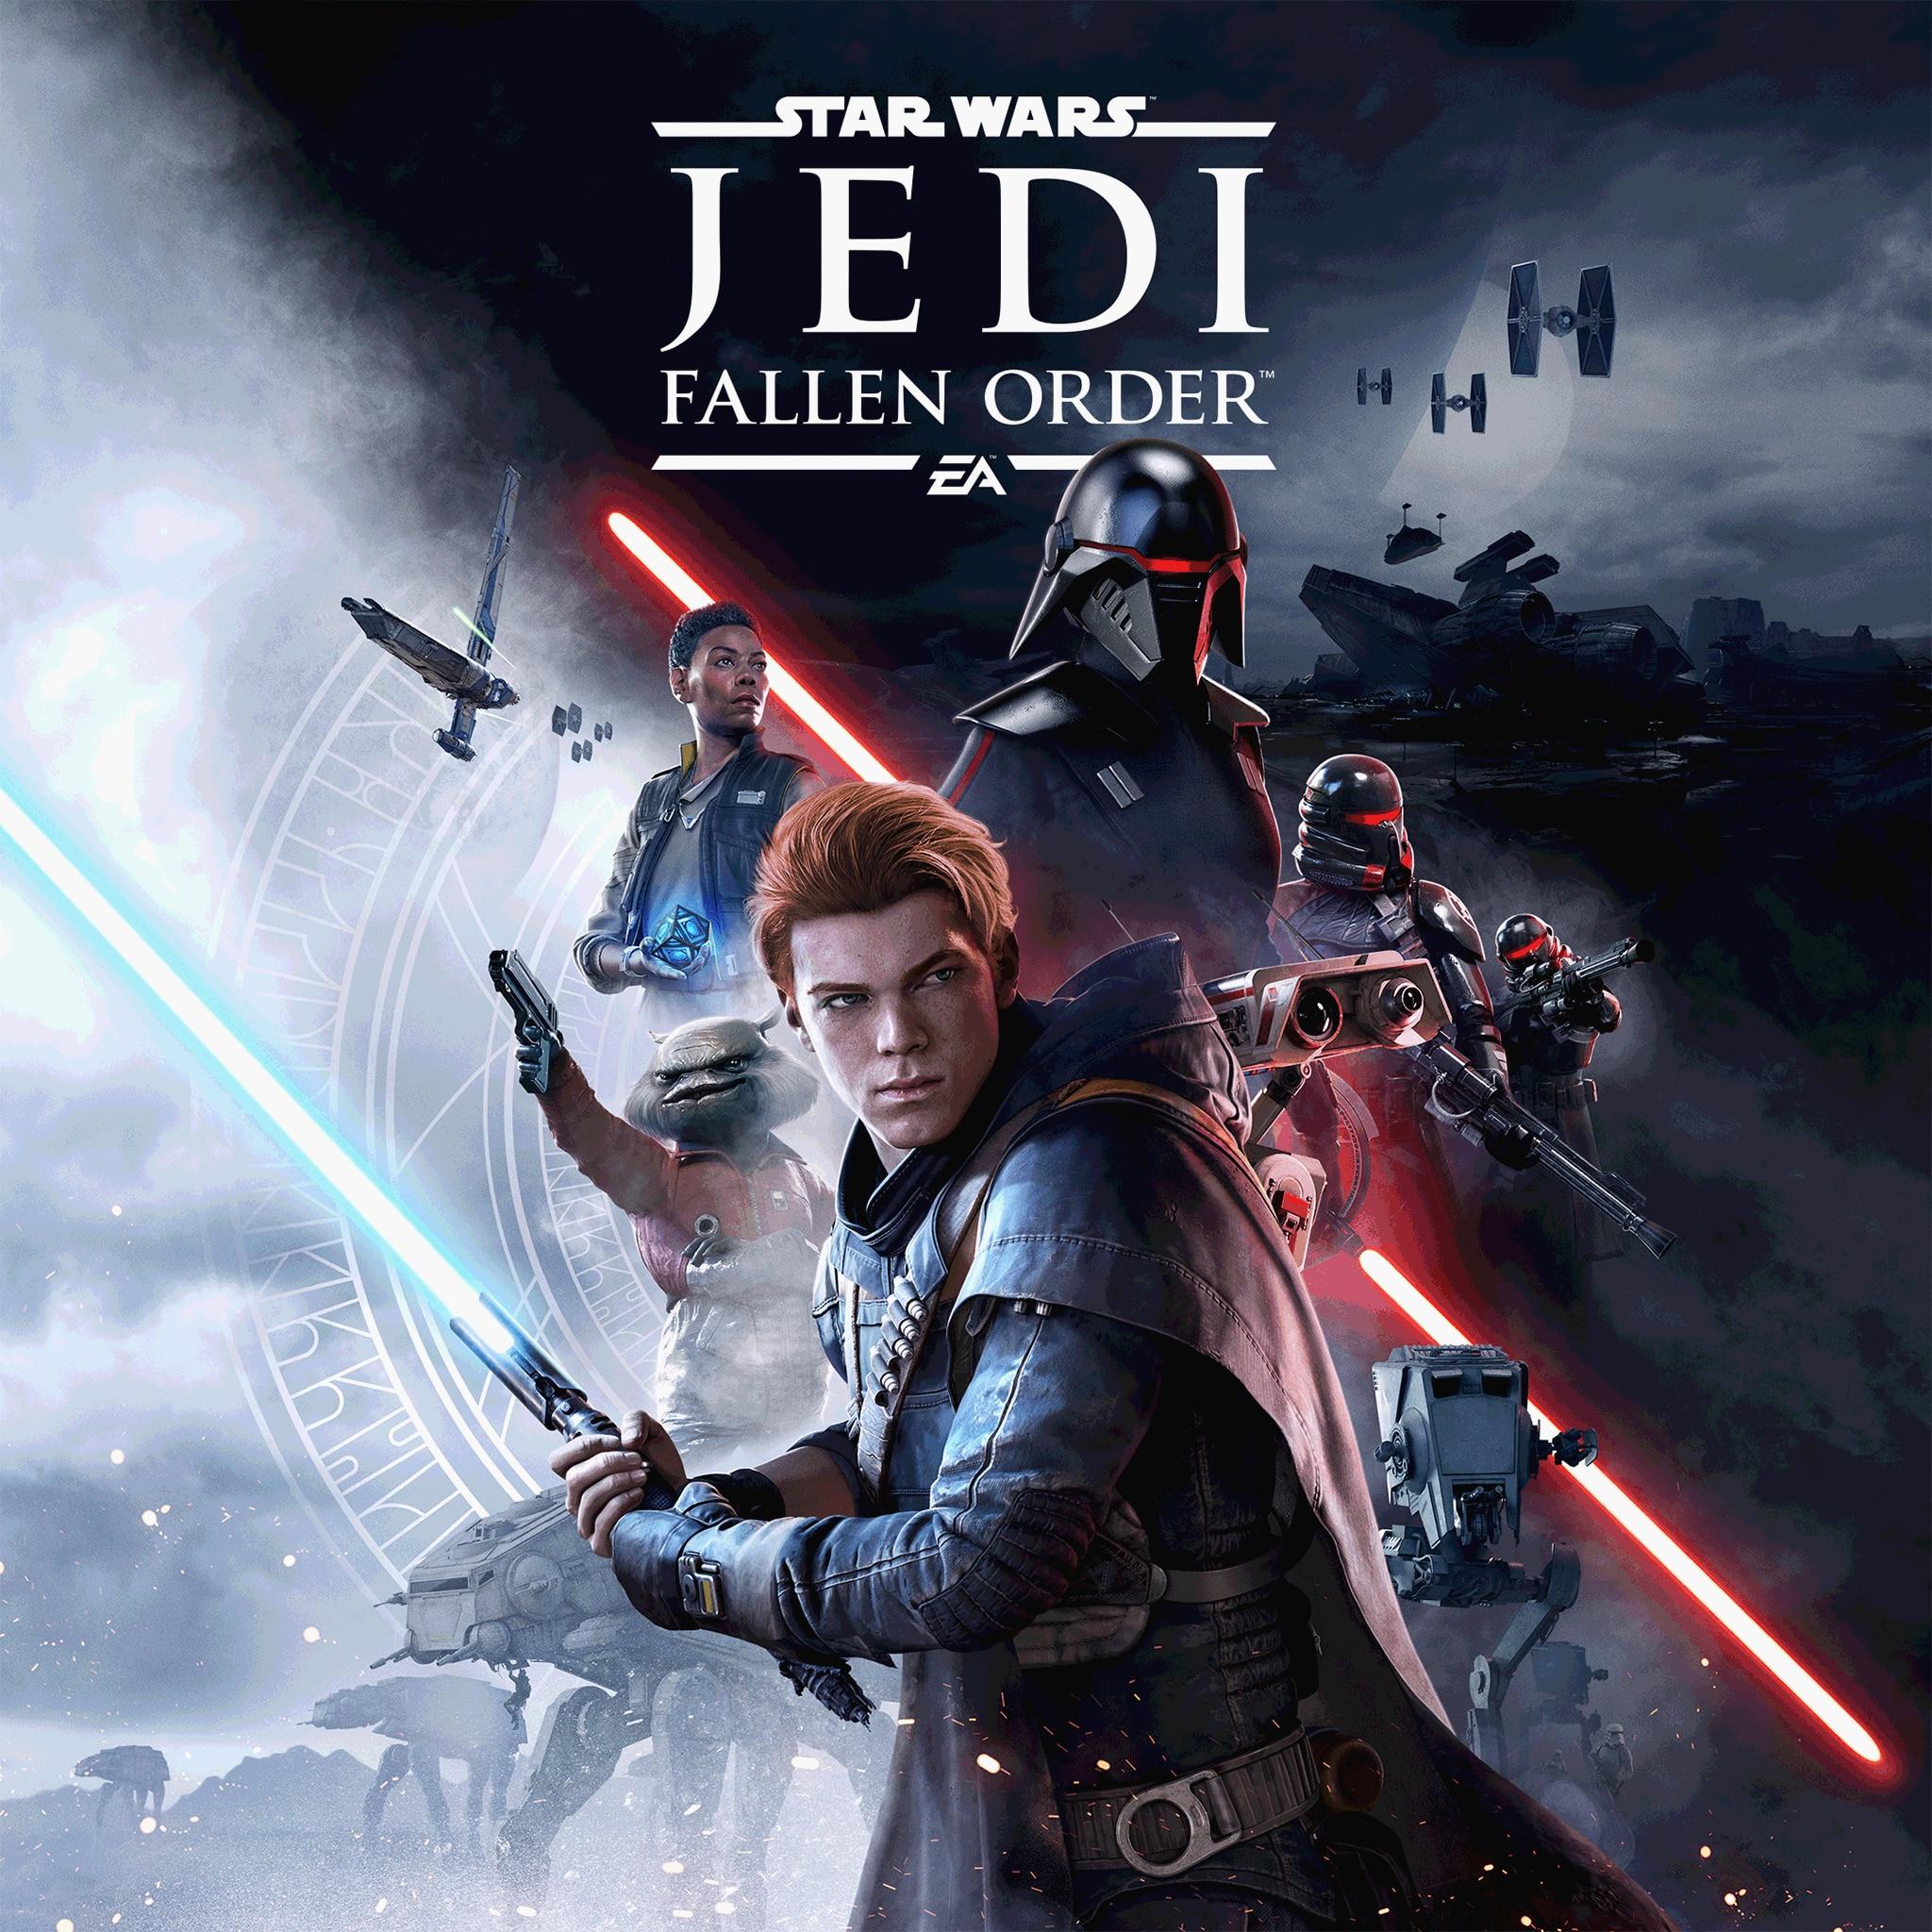 STAR WARS Jedi: Fallen Order [Google Stadia] - Free for Stadia Pro Subscribers @ Google Stadia